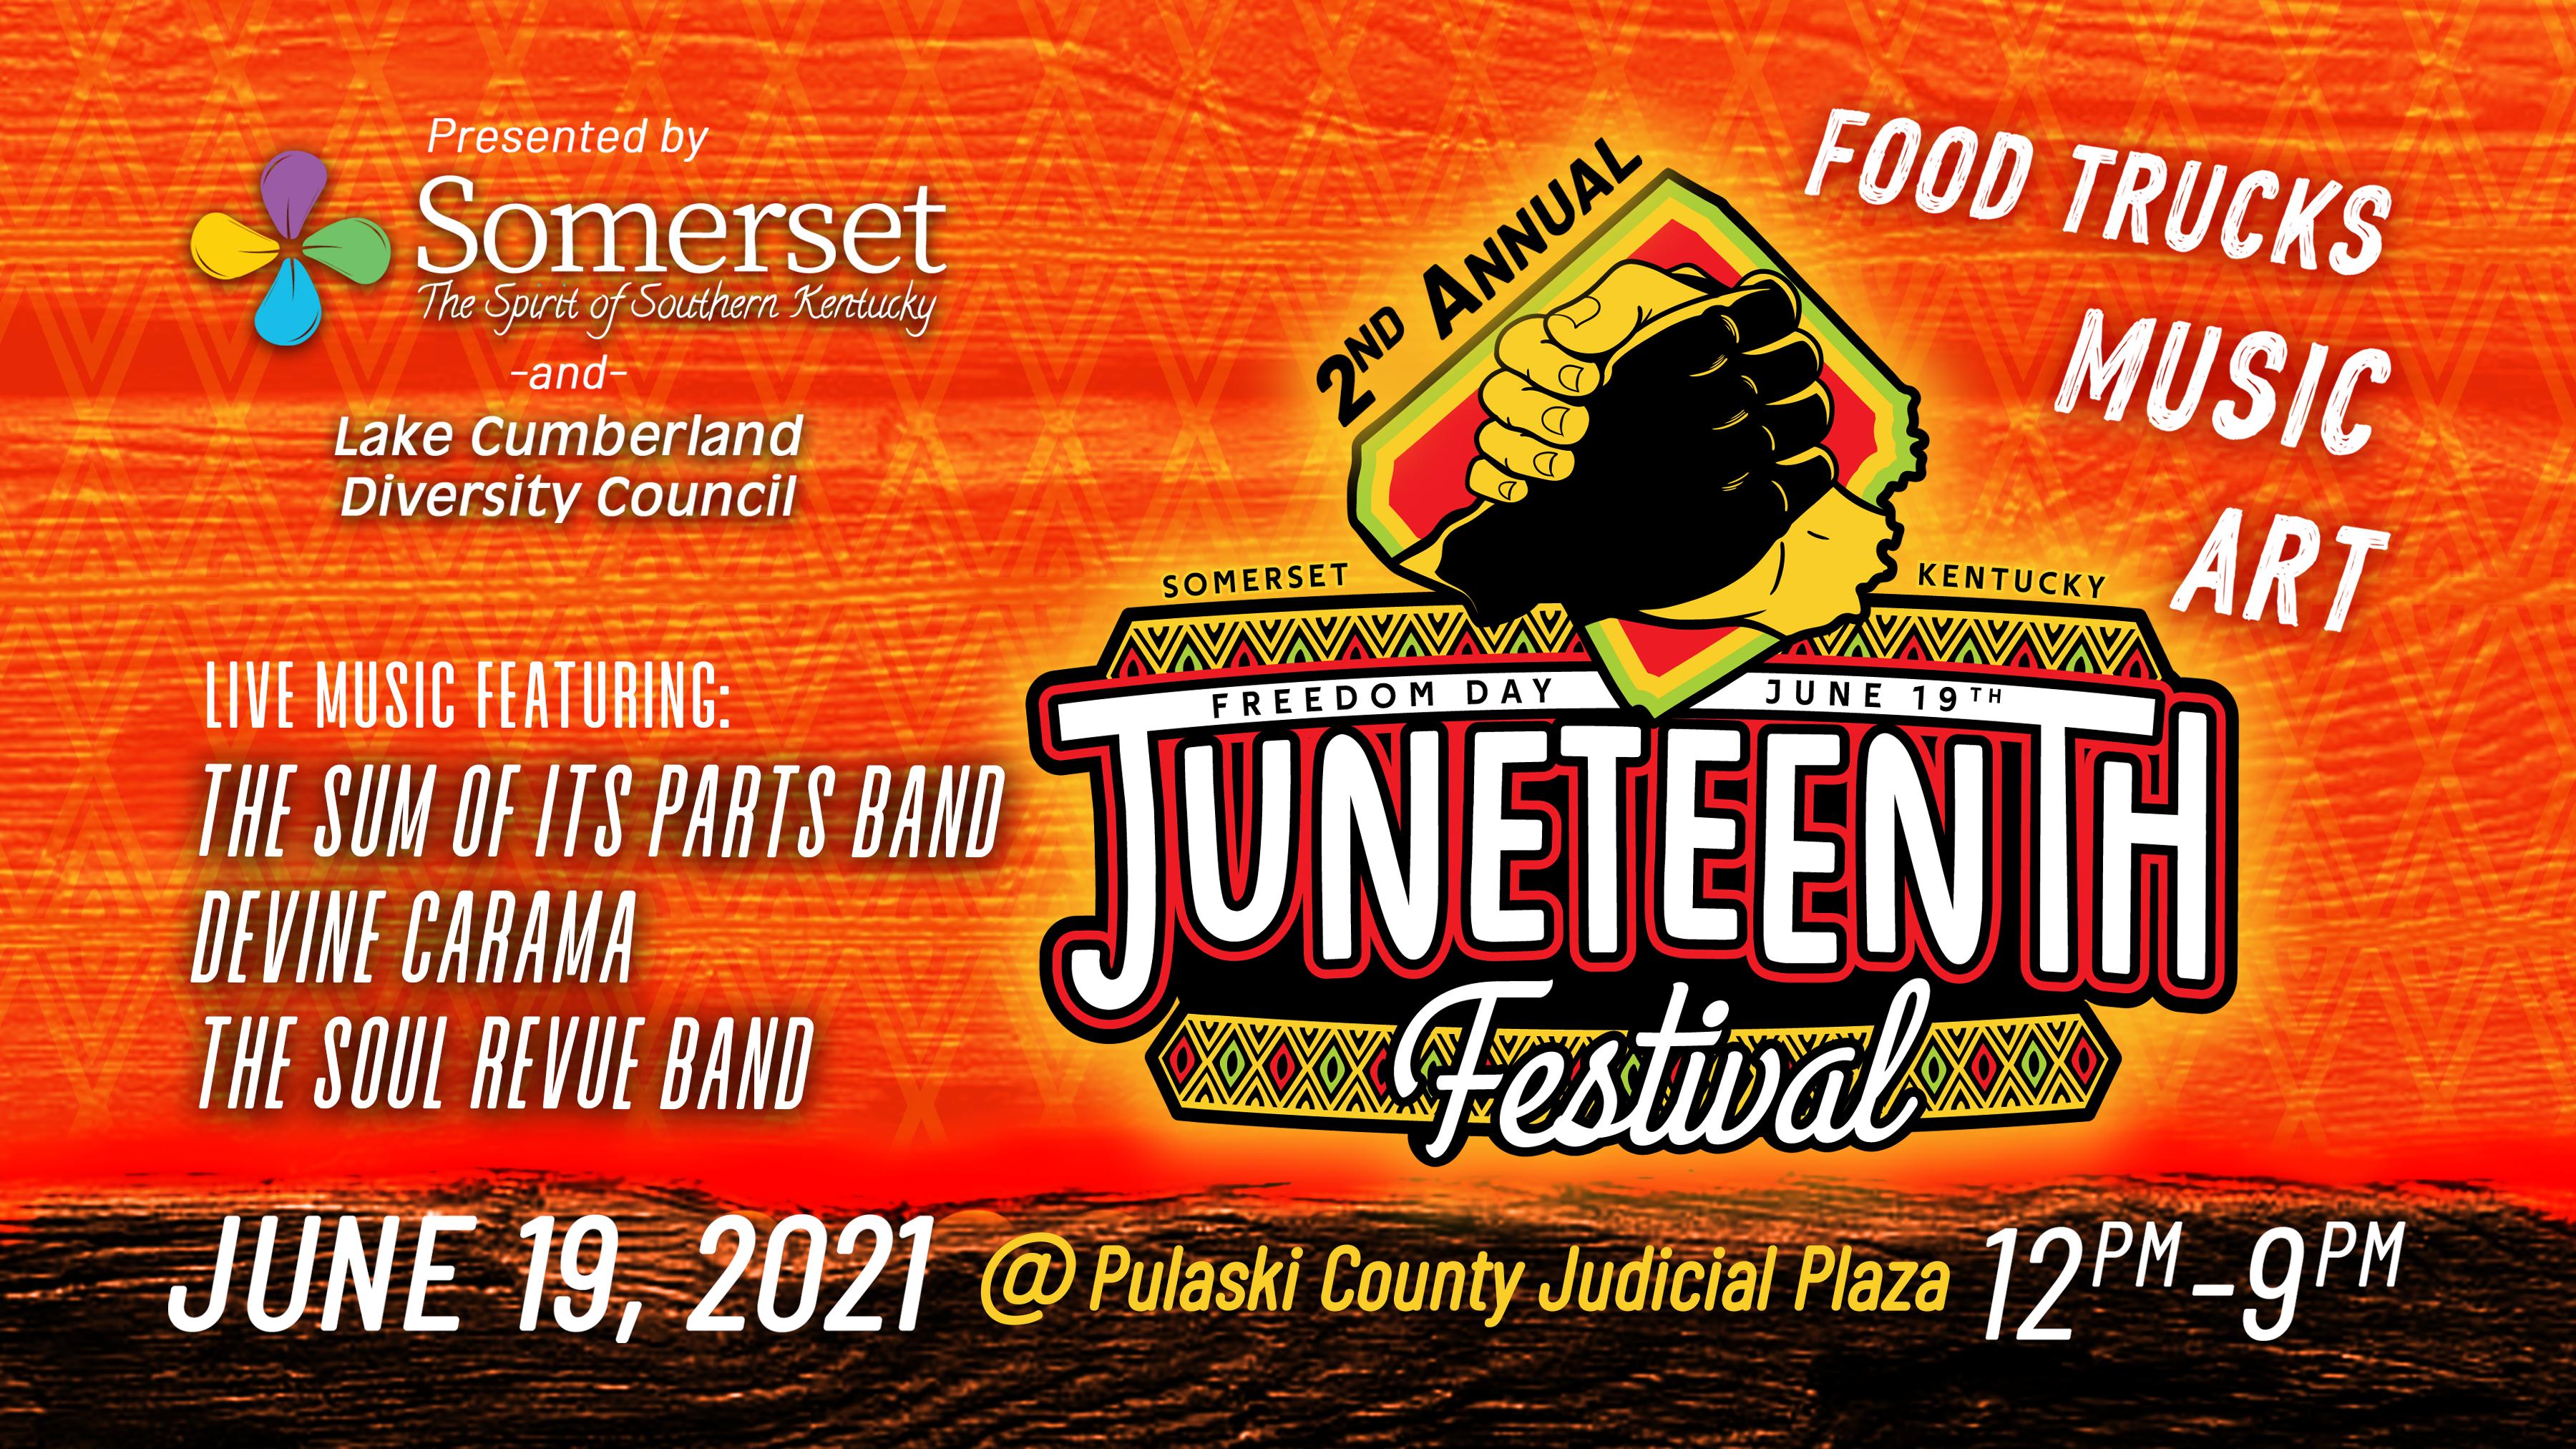 Juneteenth FB event